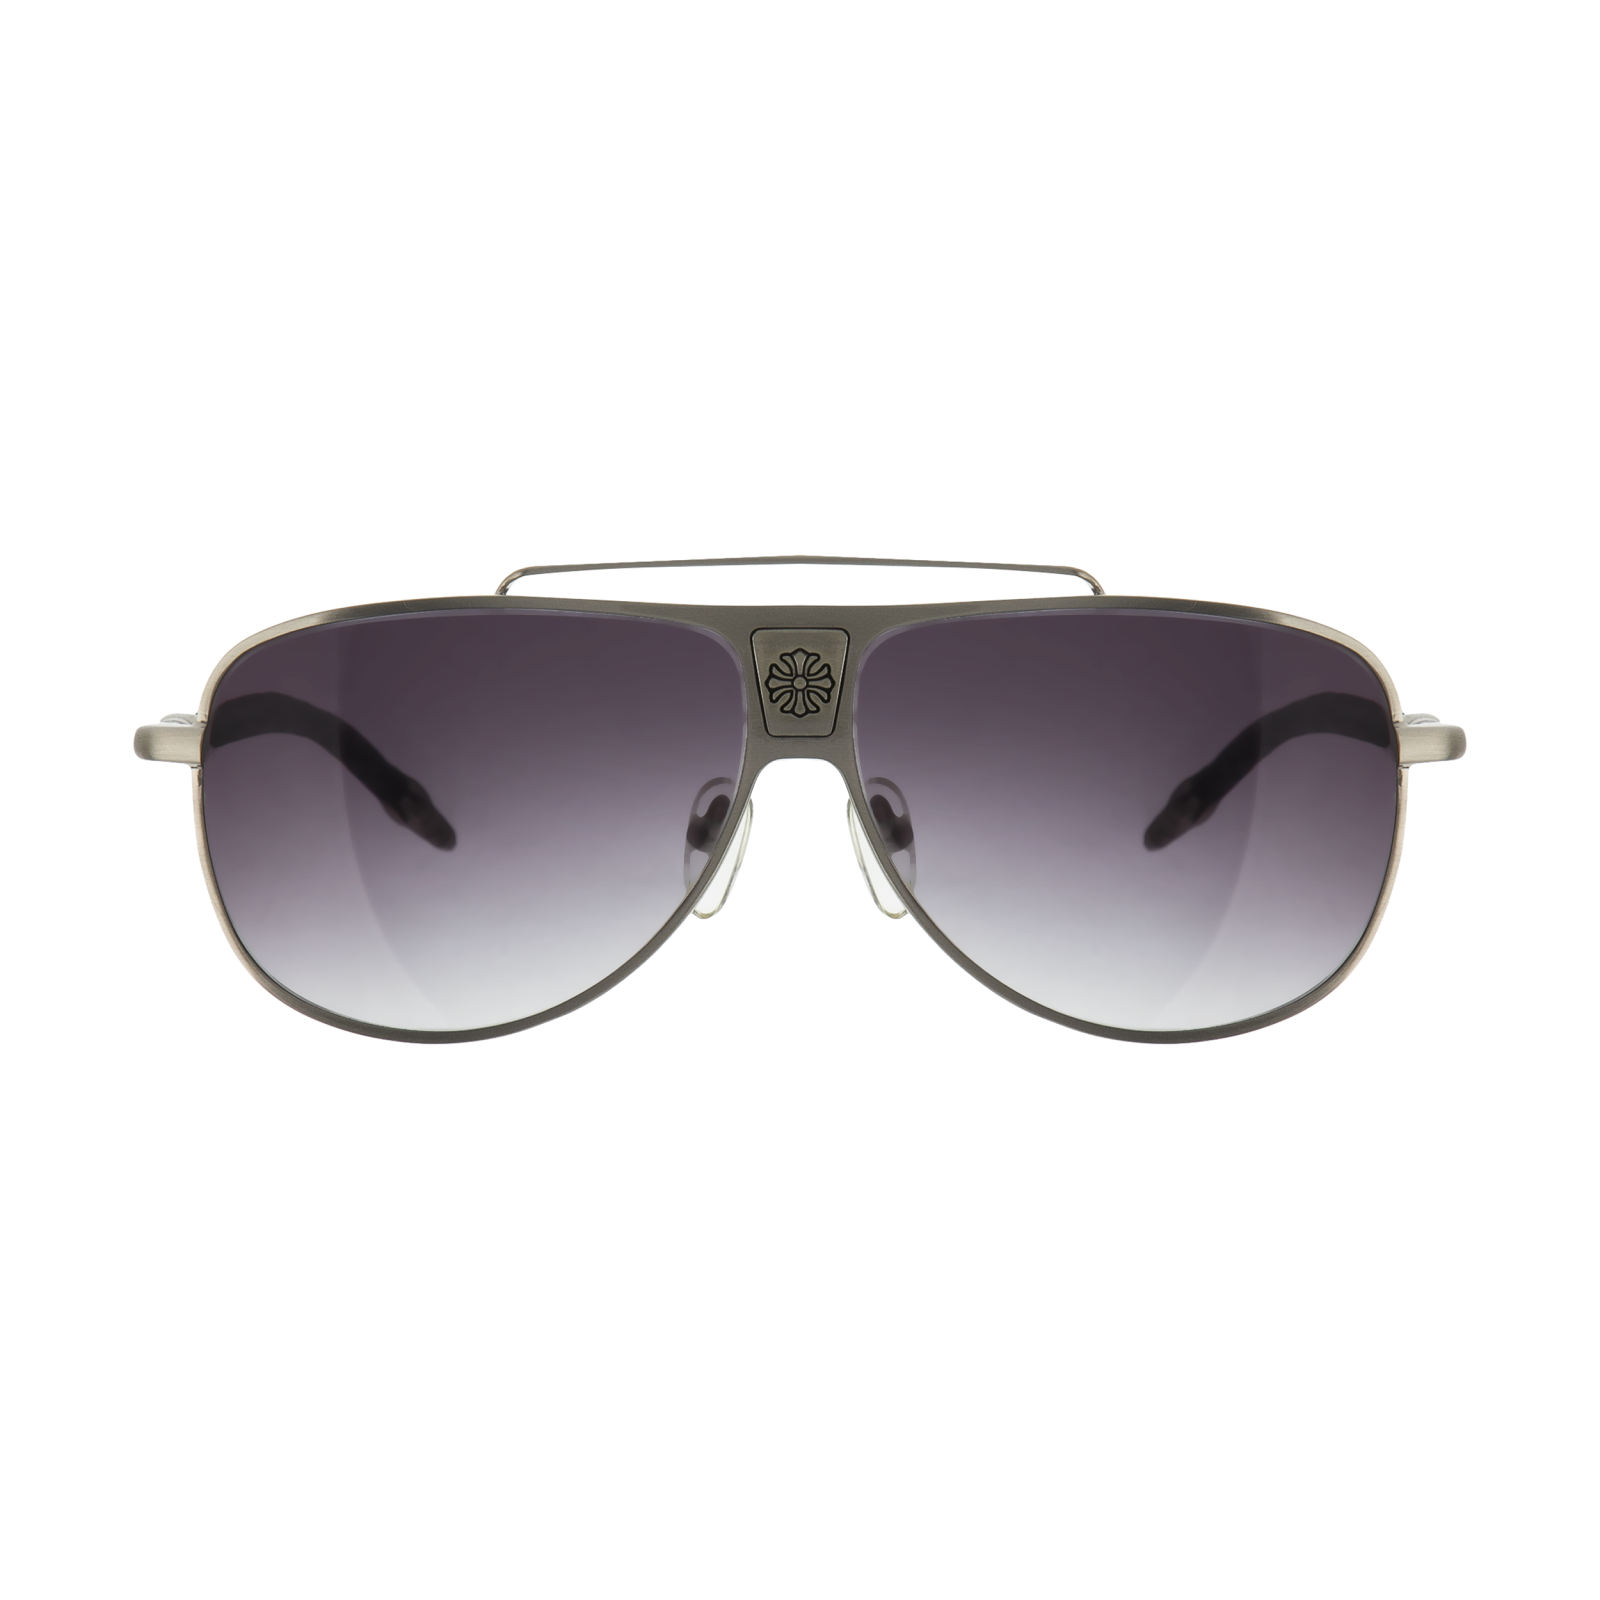 عینک آفتابی کروم هارتز مدل mine -  - 1